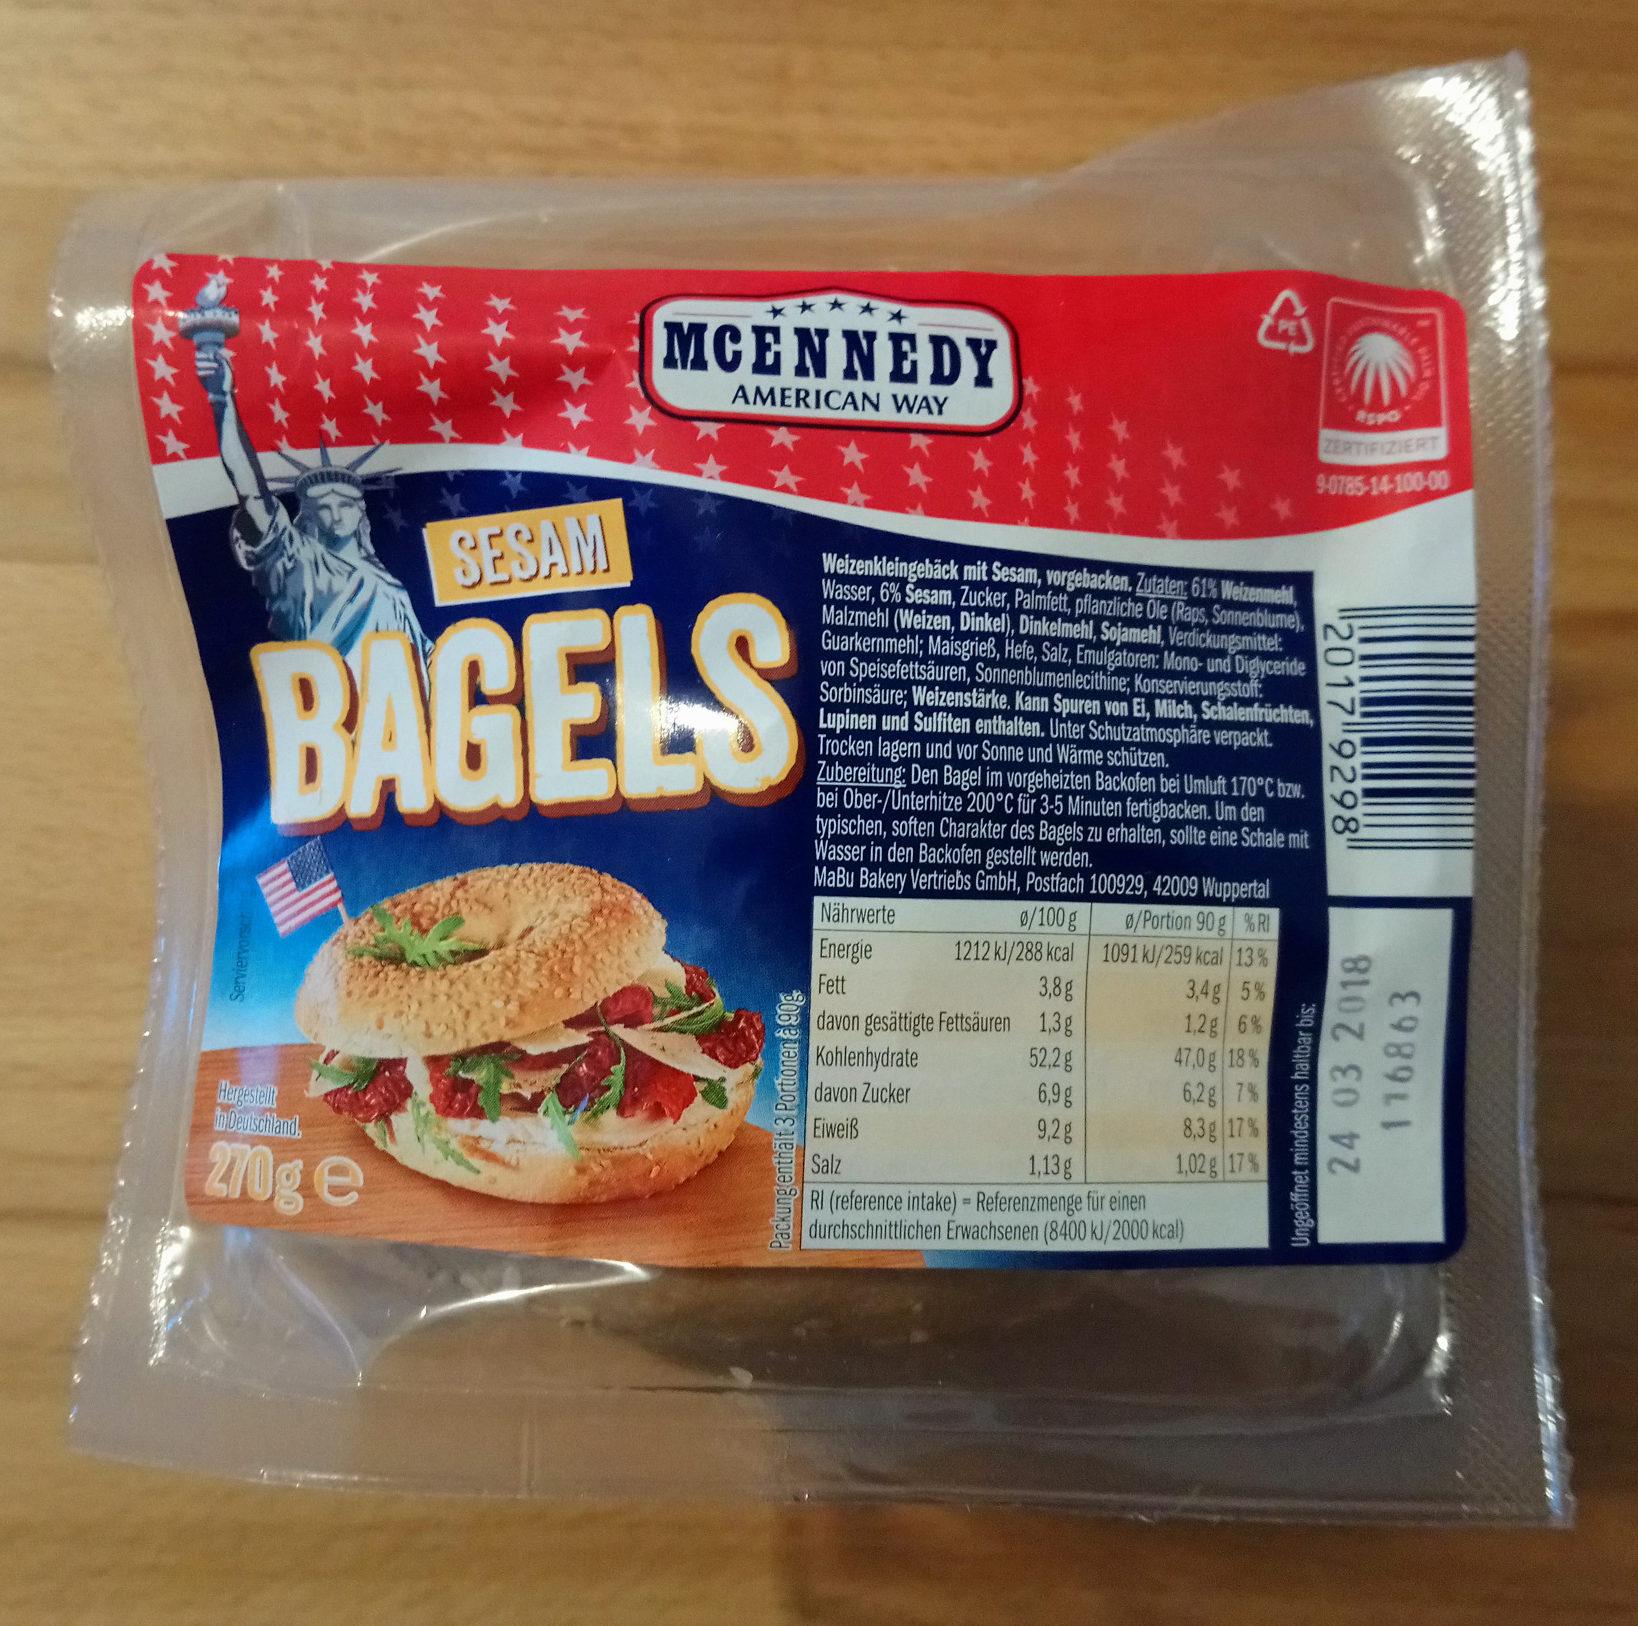 Bagels Sesam - Produkt